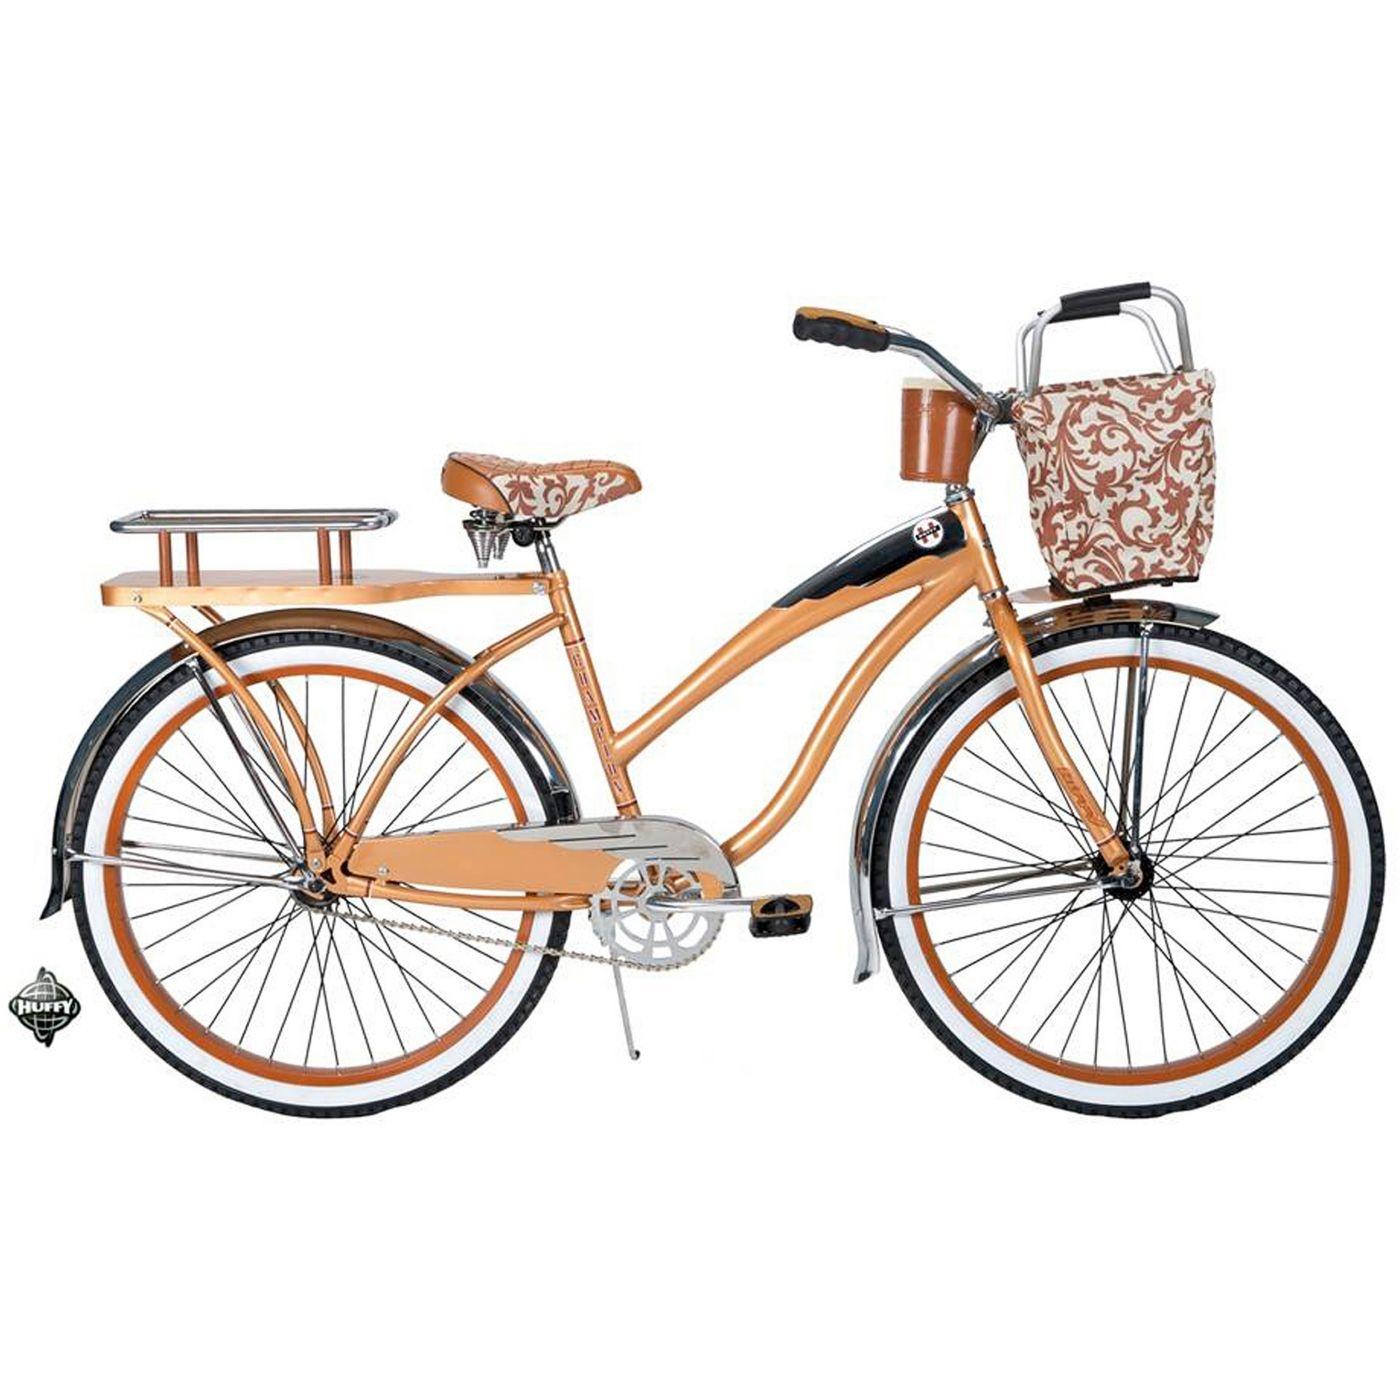 Huffy bikes nz